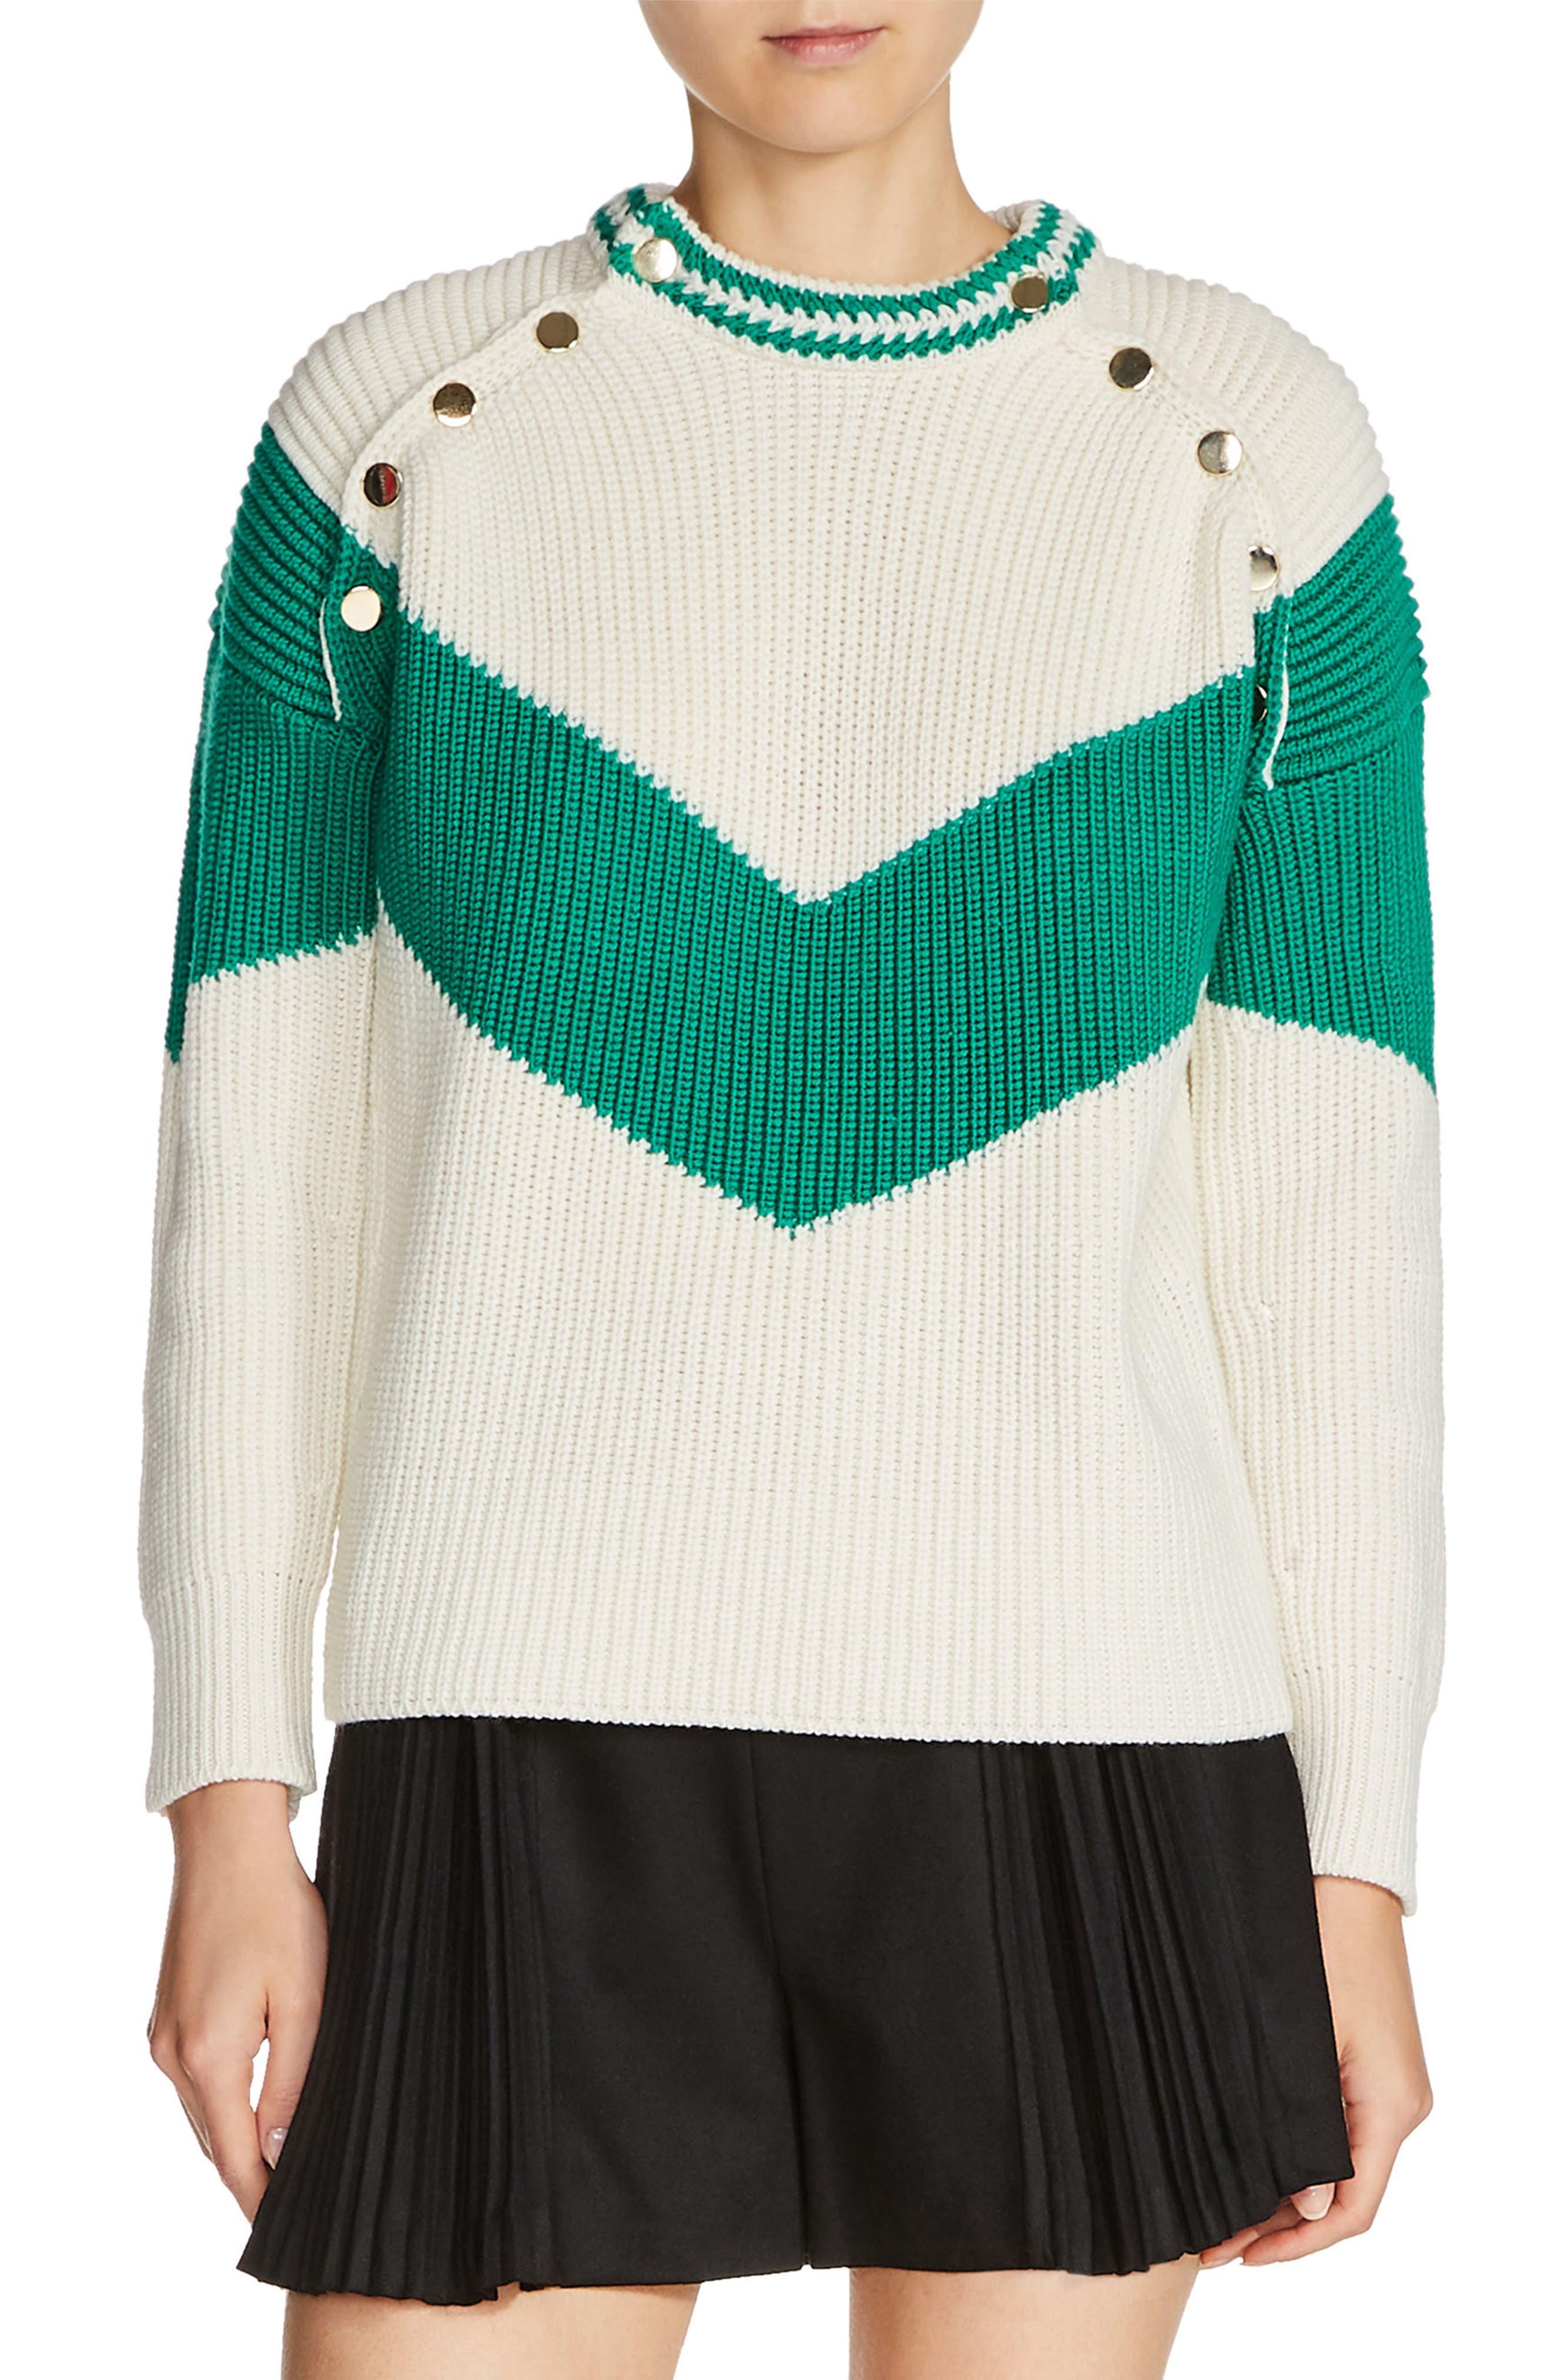 Snap Shoulder Sweater,                             Main thumbnail 1, color,                             301